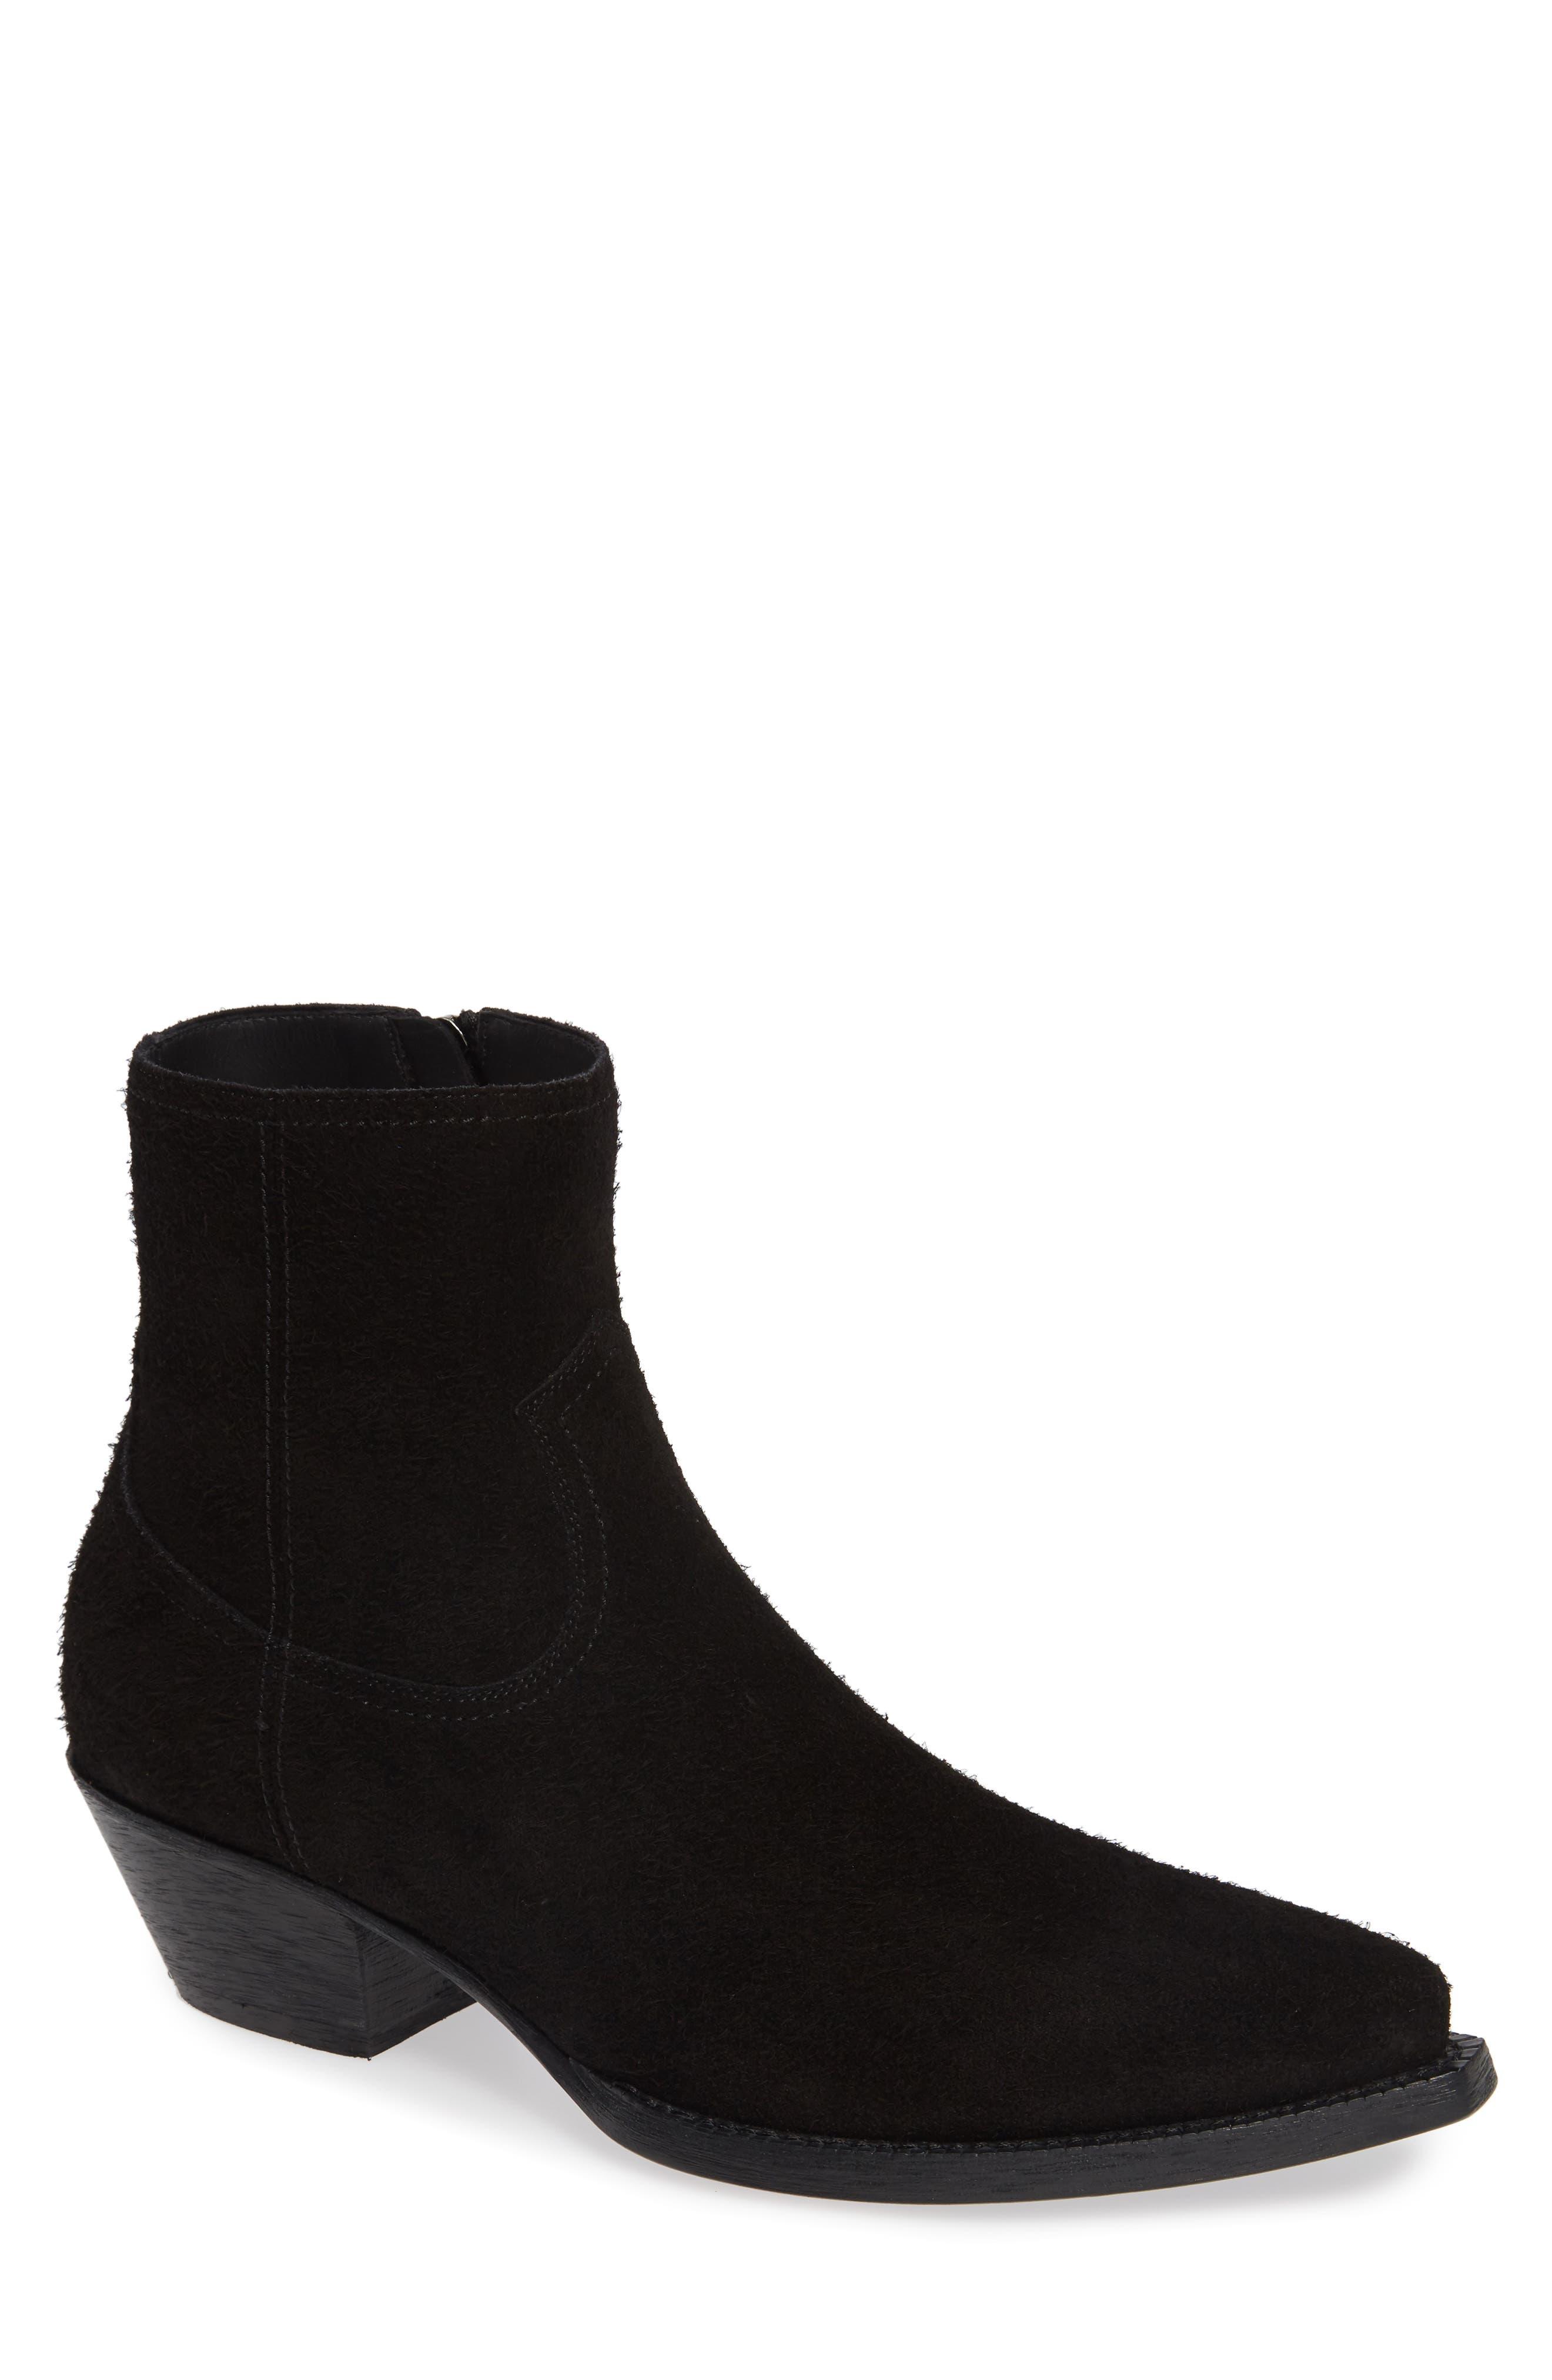 Lukas Suede Boots - Black Size 10 M